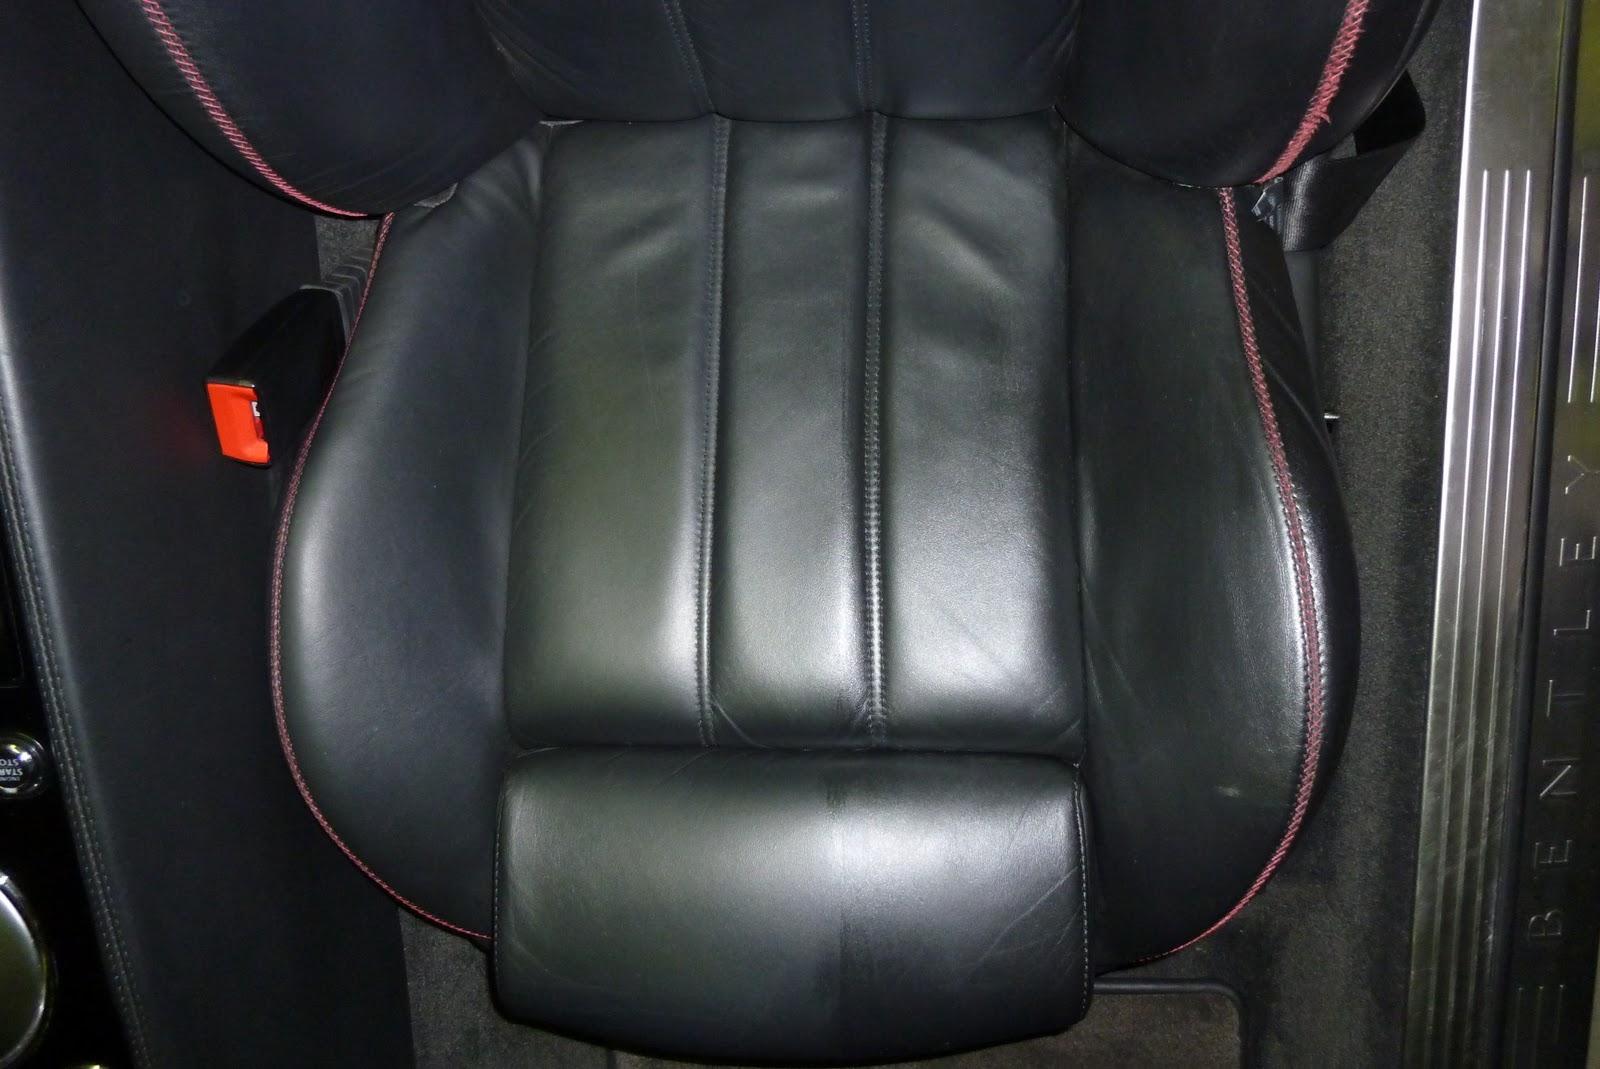 protection cuir protection cuir sieges voiture canape en cuir banquettes de bateau chaussures. Black Bedroom Furniture Sets. Home Design Ideas